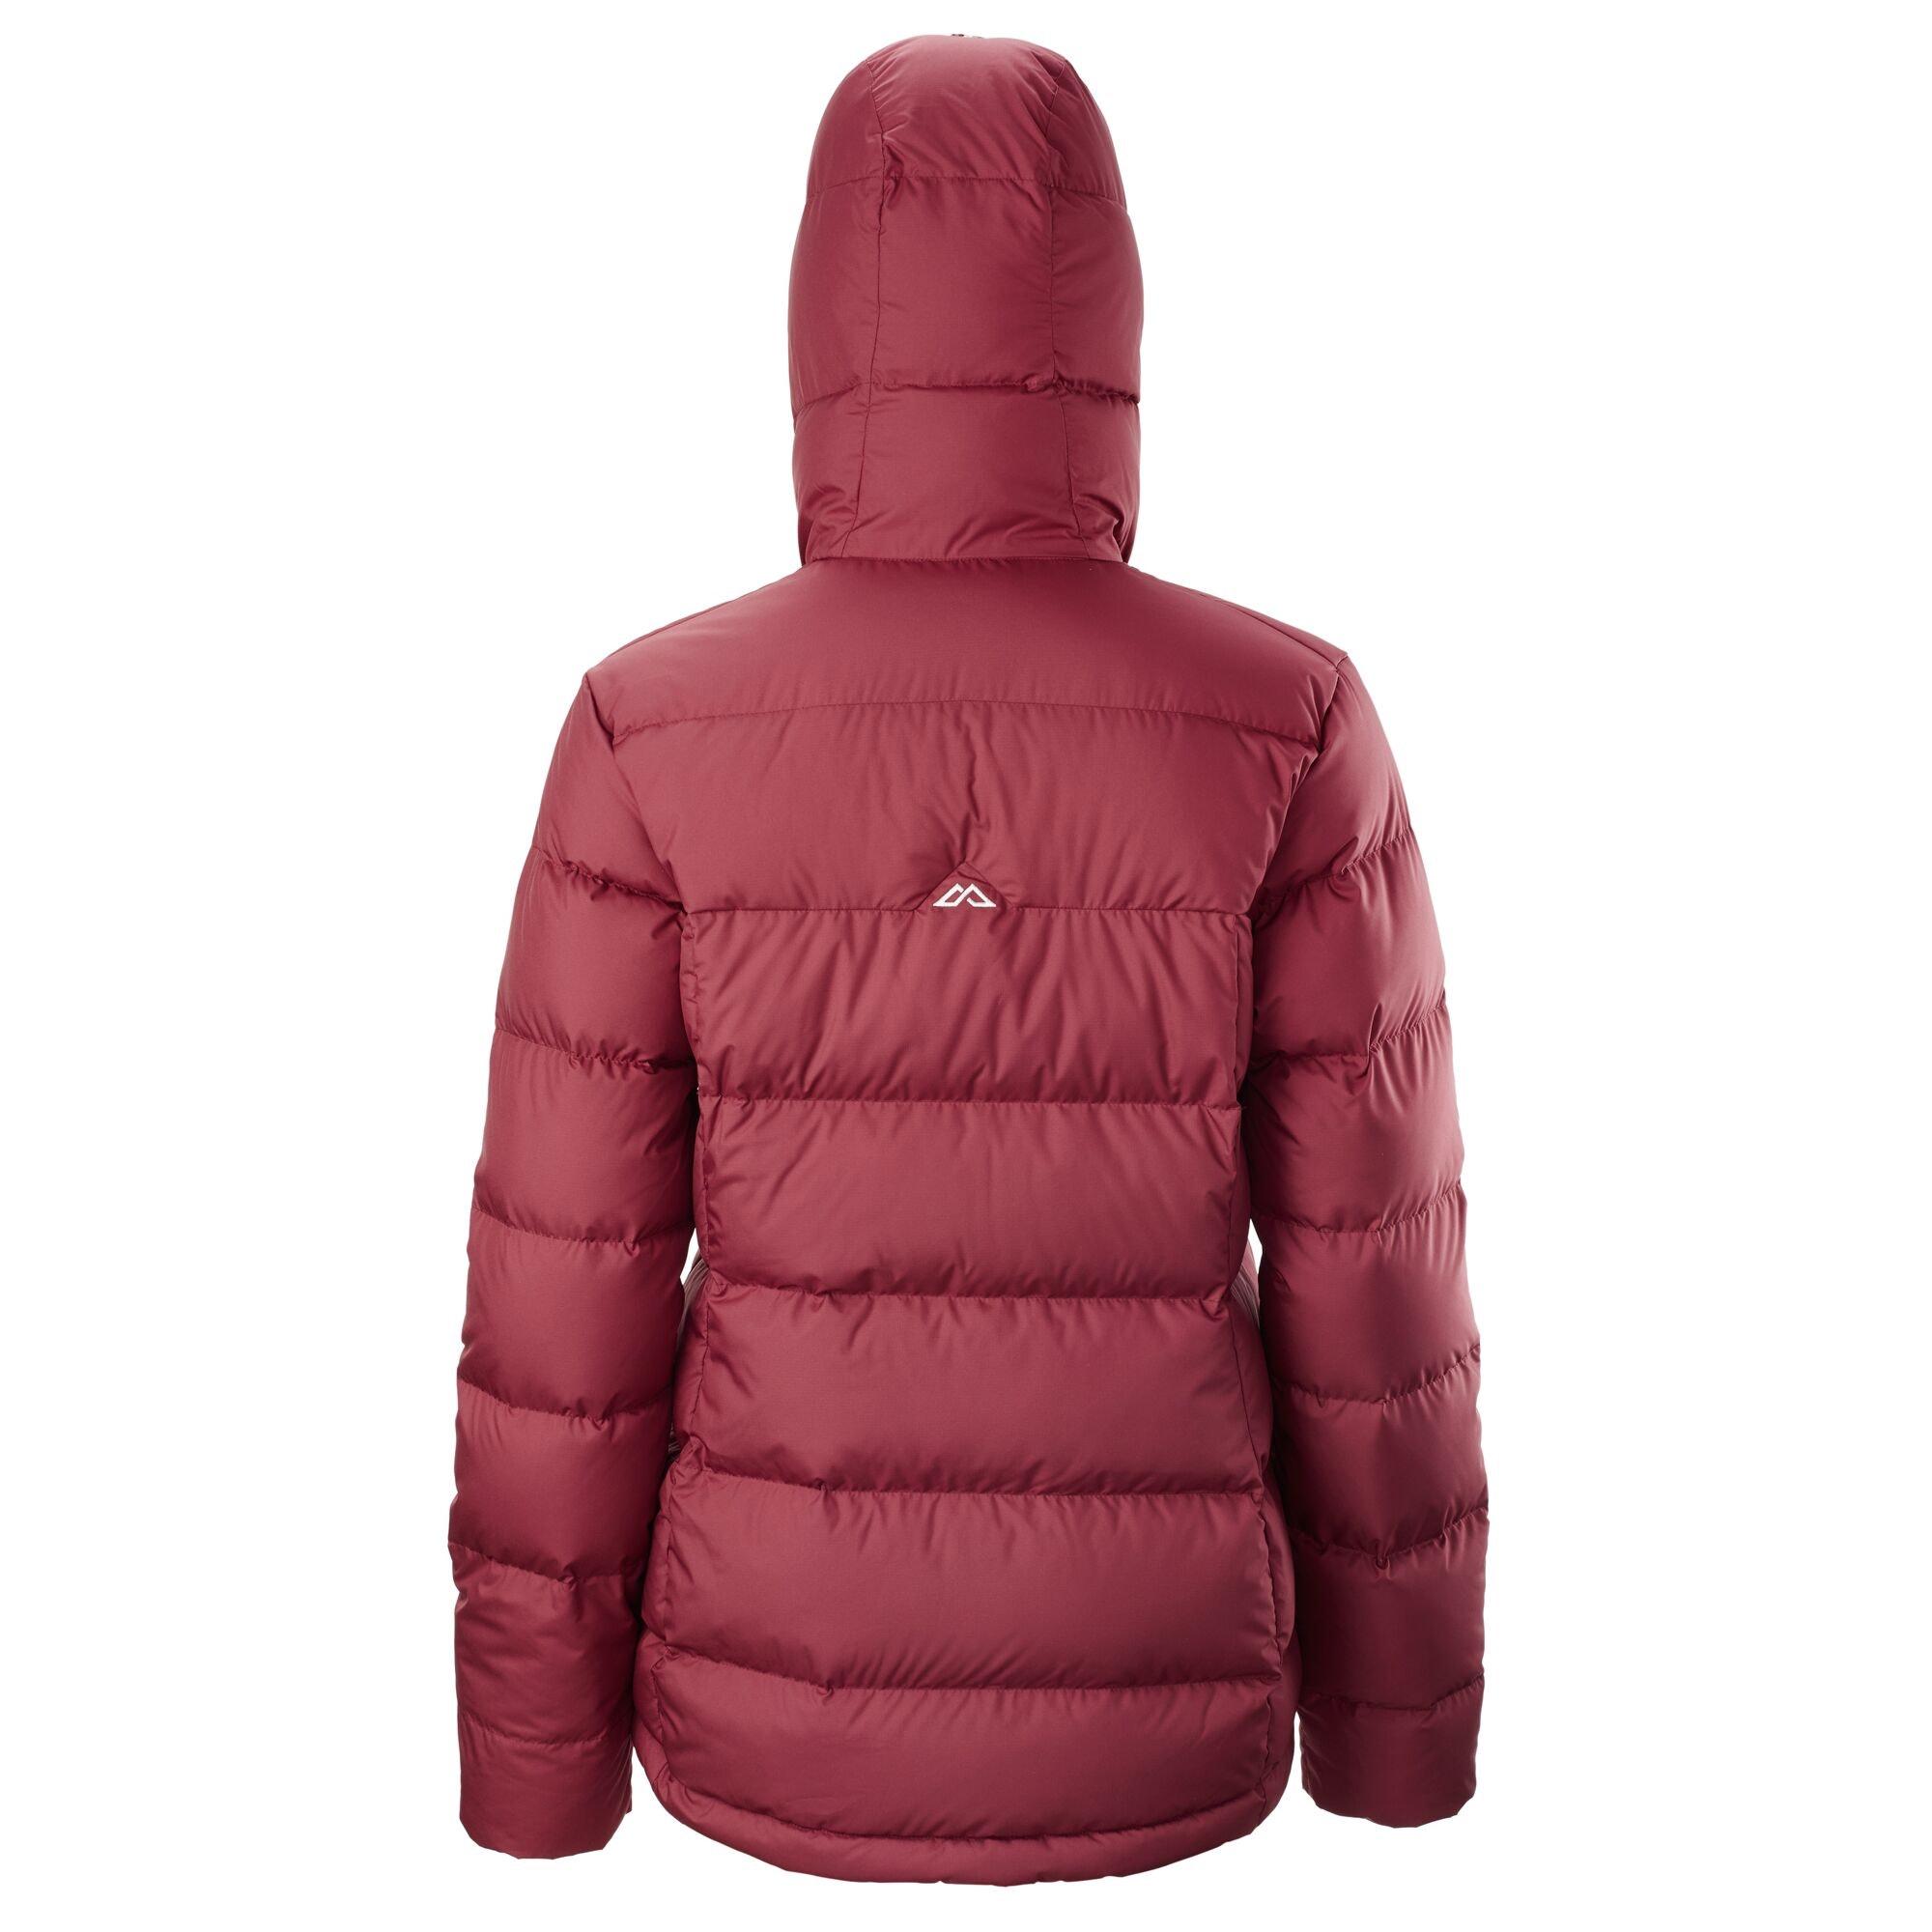 thumbnail 33 - NEW Kathmandu Epiq Womens Hooded Down Puffer 600 Fill Warm Outdoor Winter Jacket